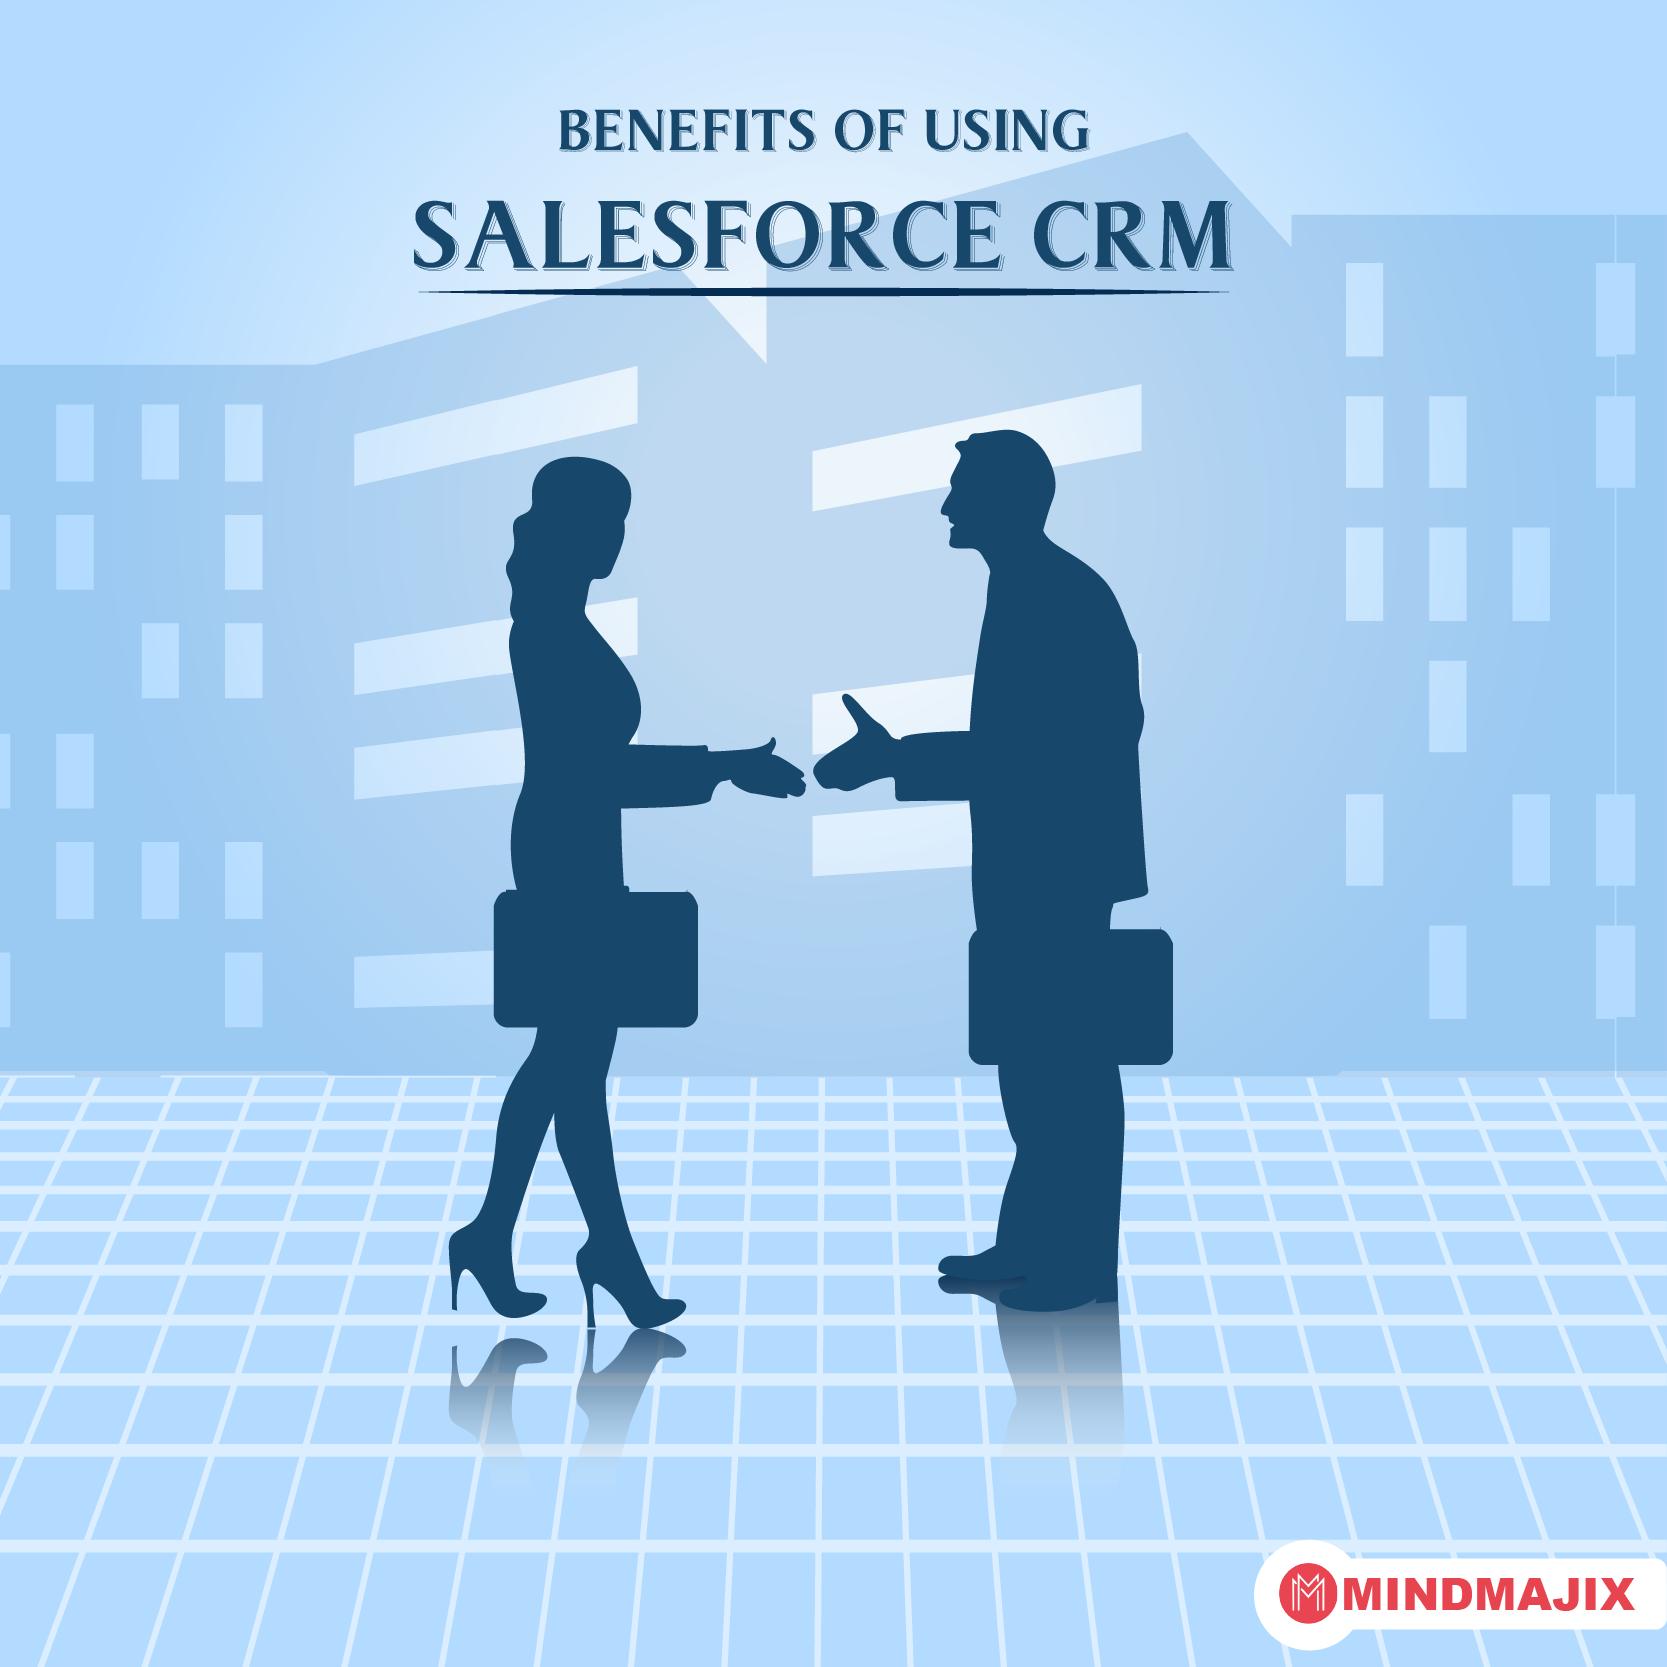 Benefits of Using Salesforce CRM